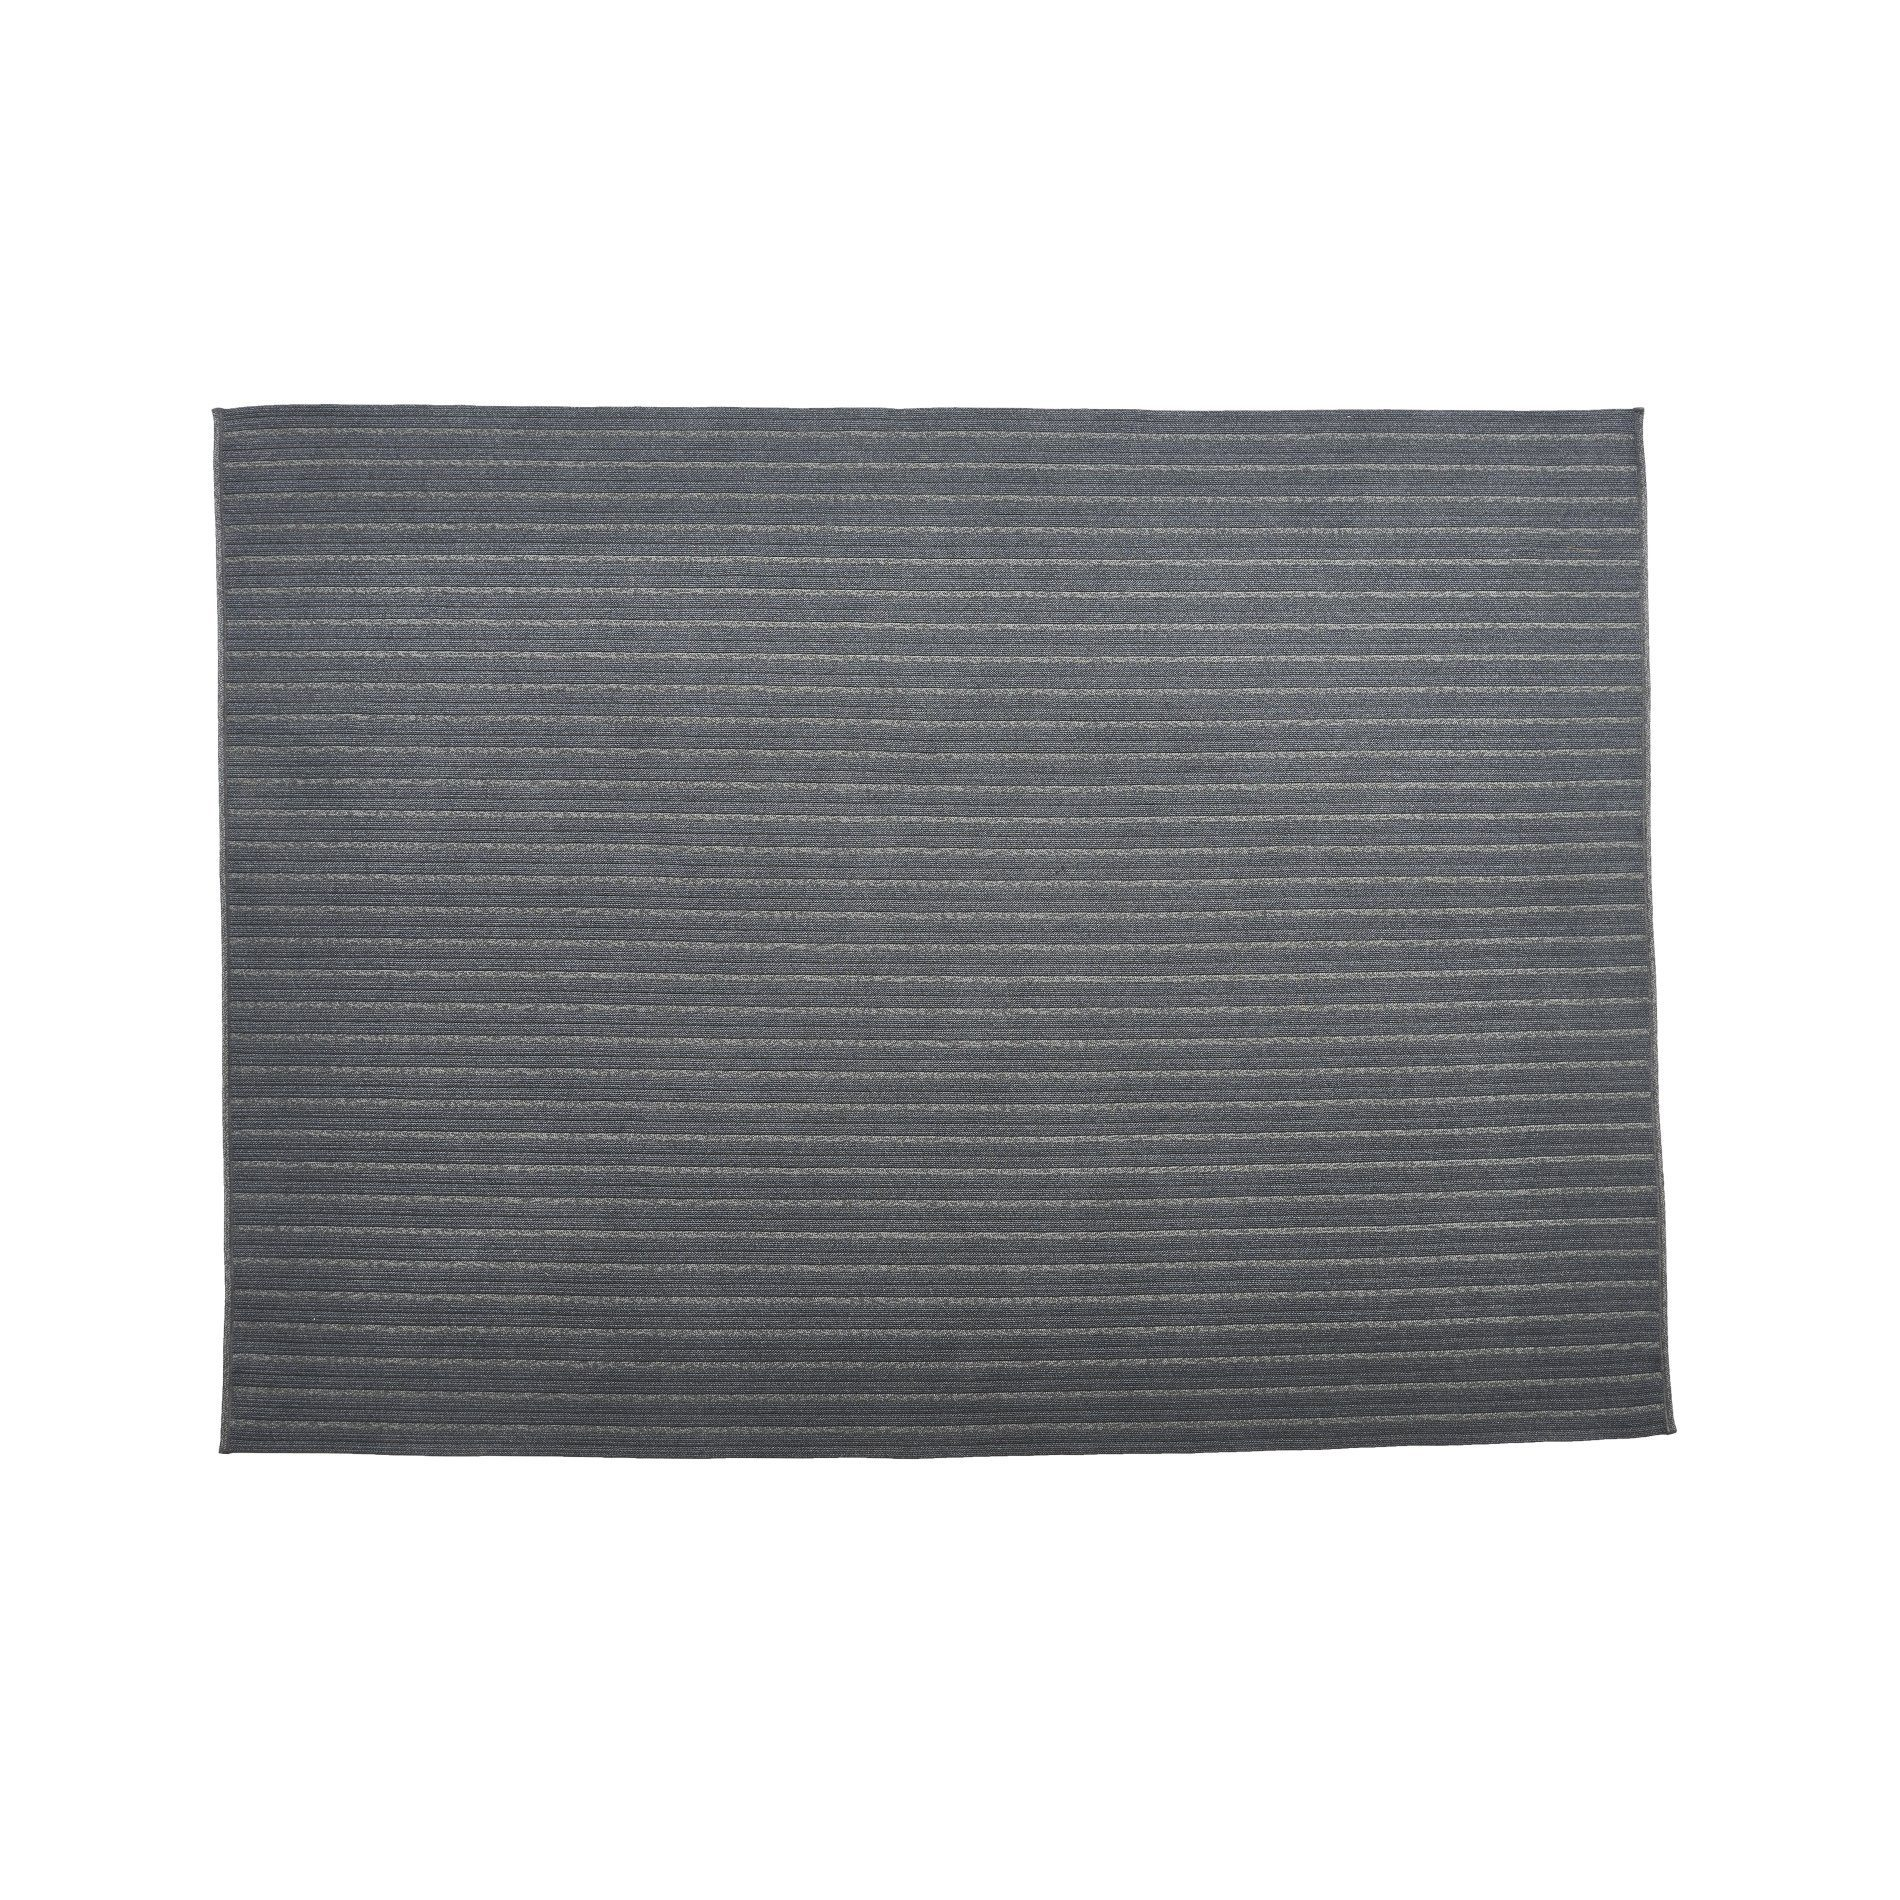 cane line lines outdoor teppich. Black Bedroom Furniture Sets. Home Design Ideas